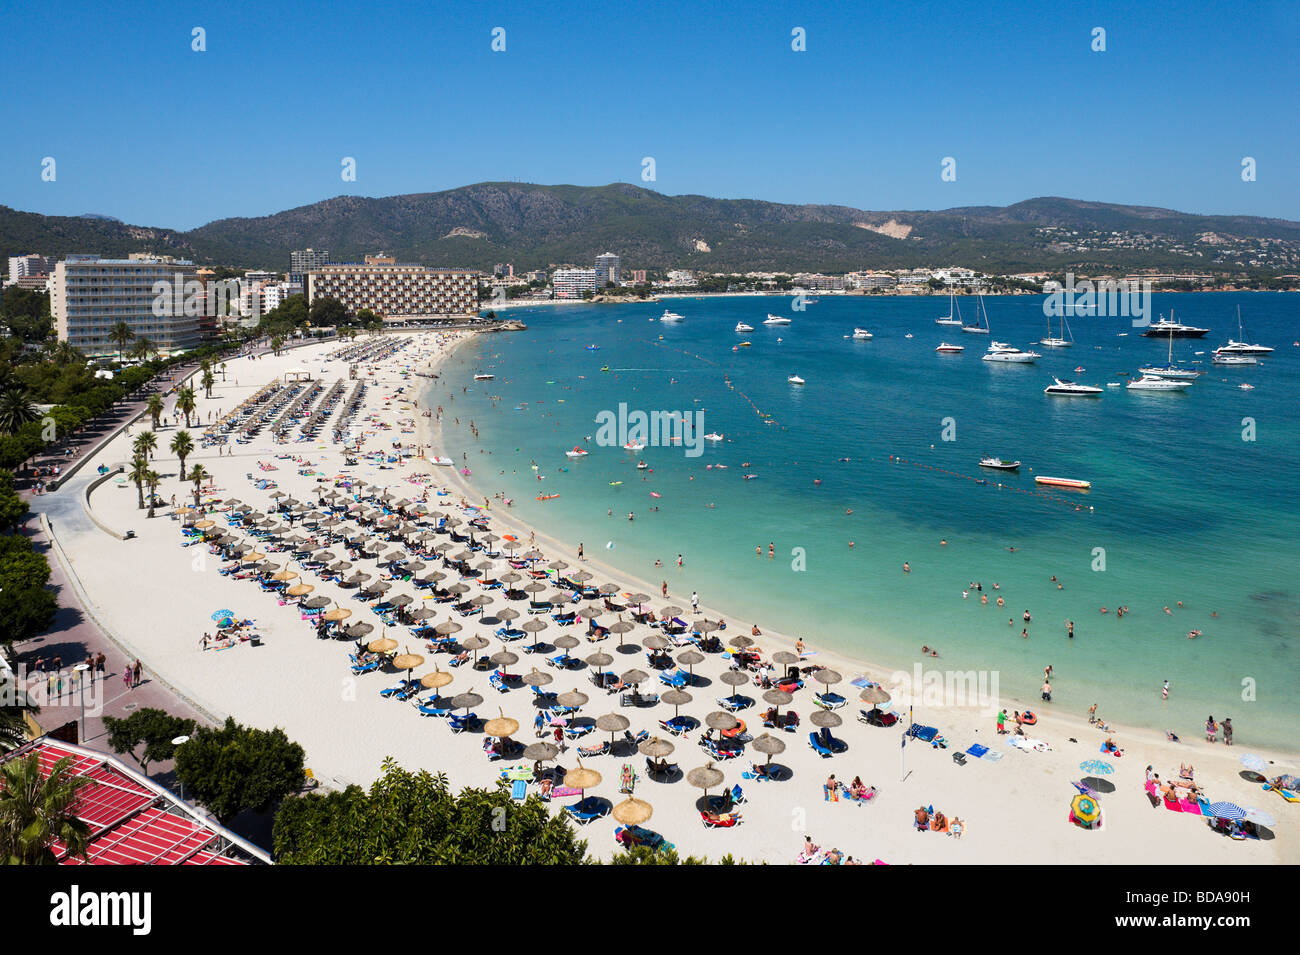 Vistas a la principal playa de palmanova bah a de palma - Mallorca islas baleares ...